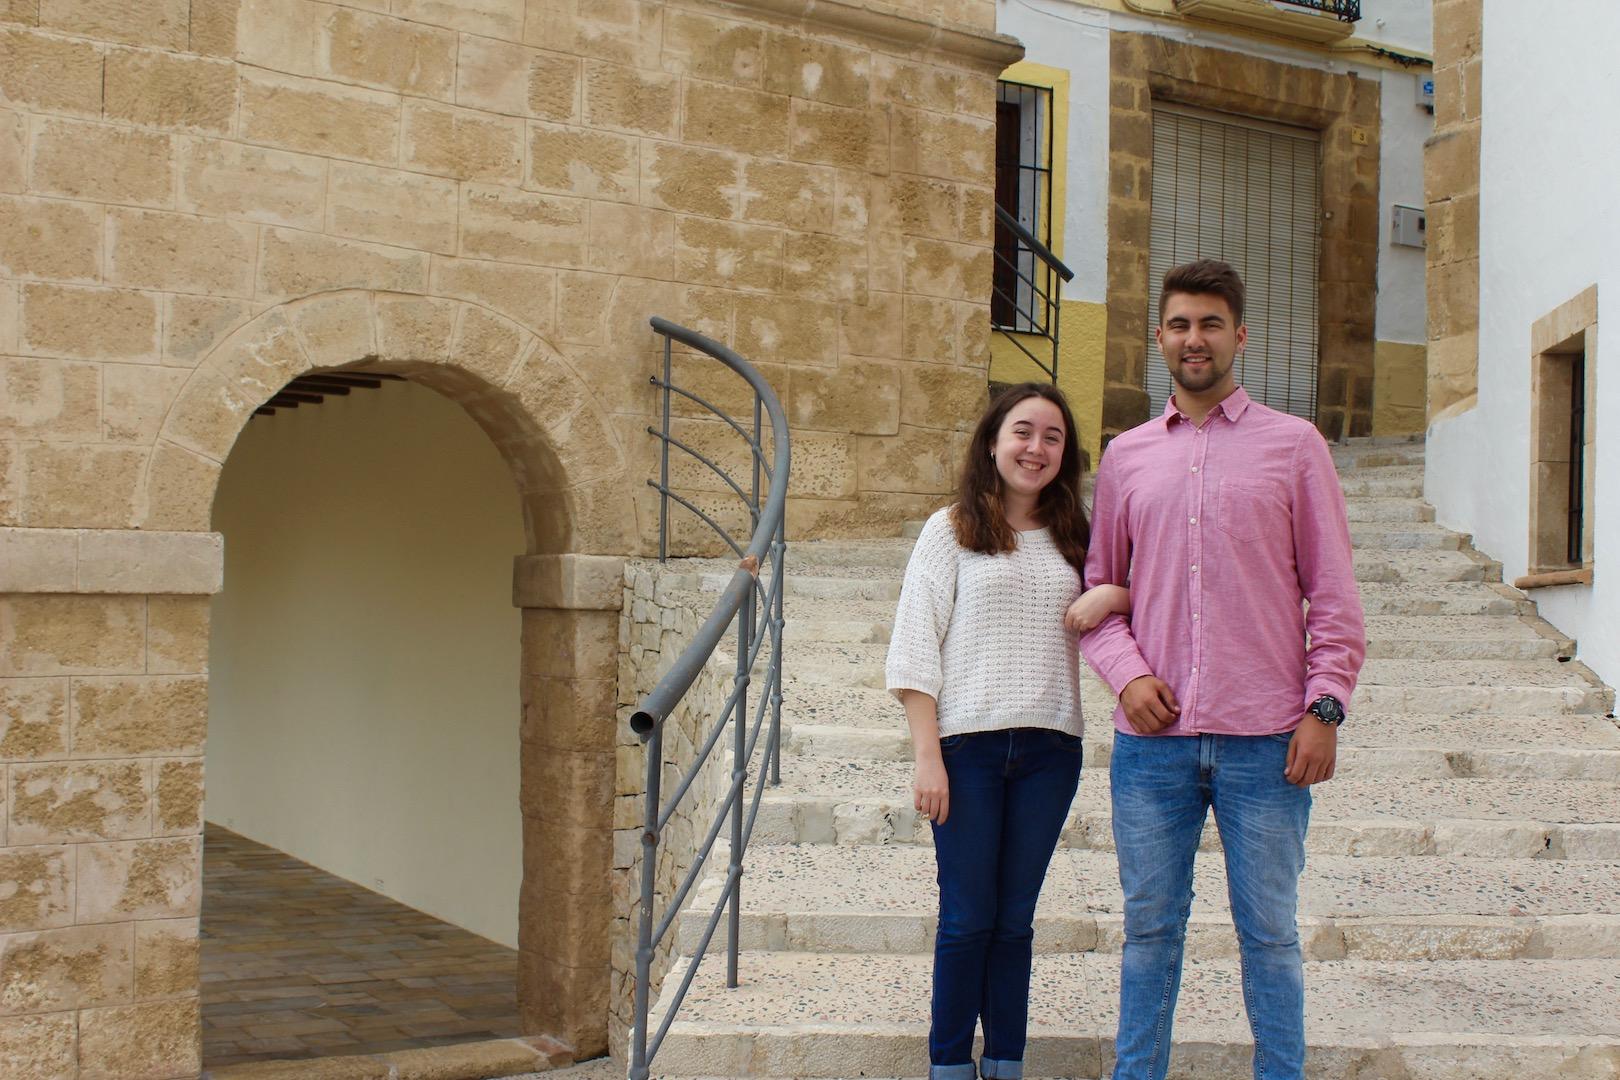 Cristina junto a su acompañante Vicent Castillo Vallés